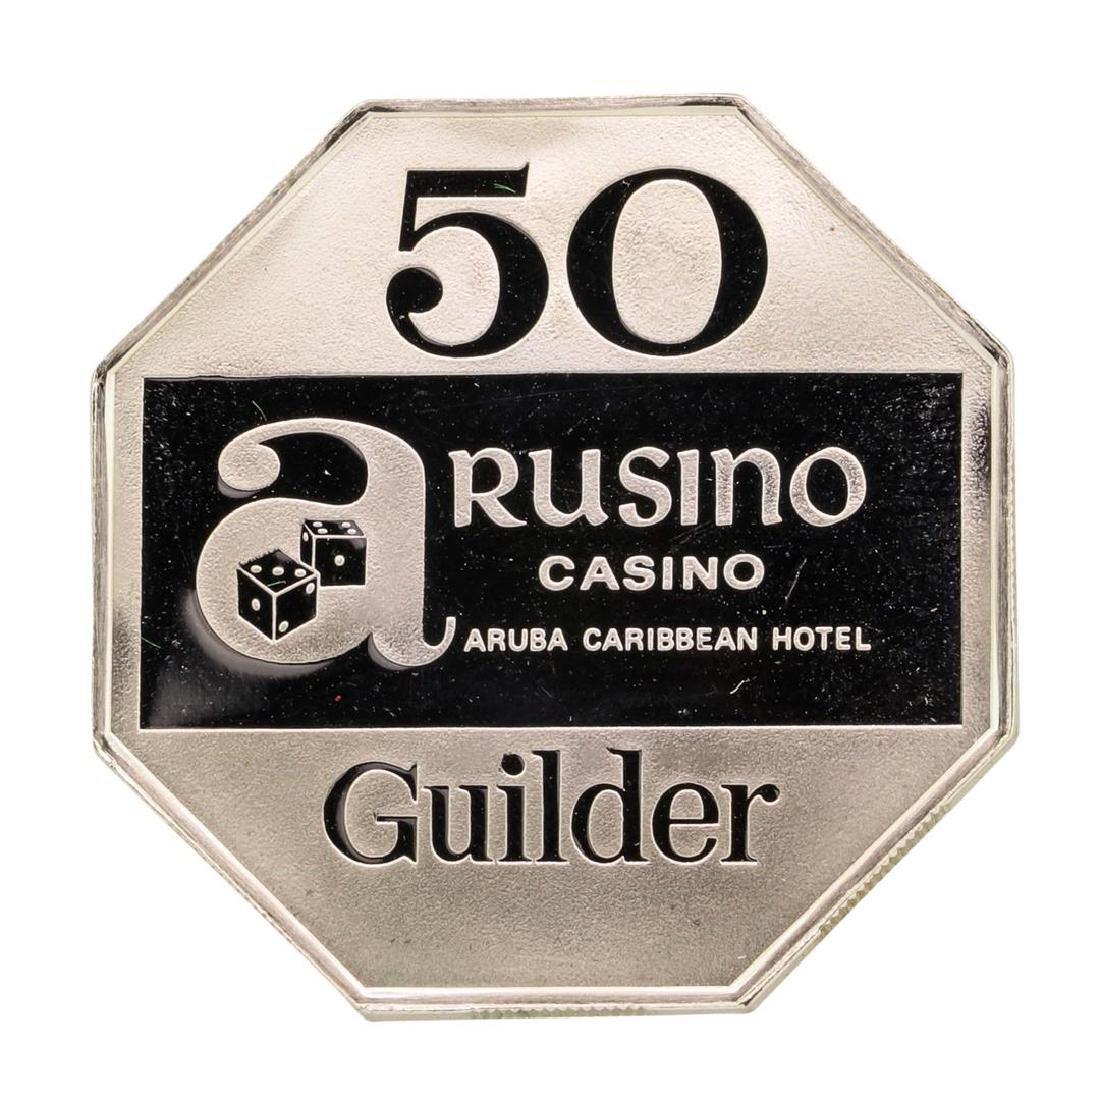 Rusino Casino Aruba Caribbean 14.4 gram .925 Sterling